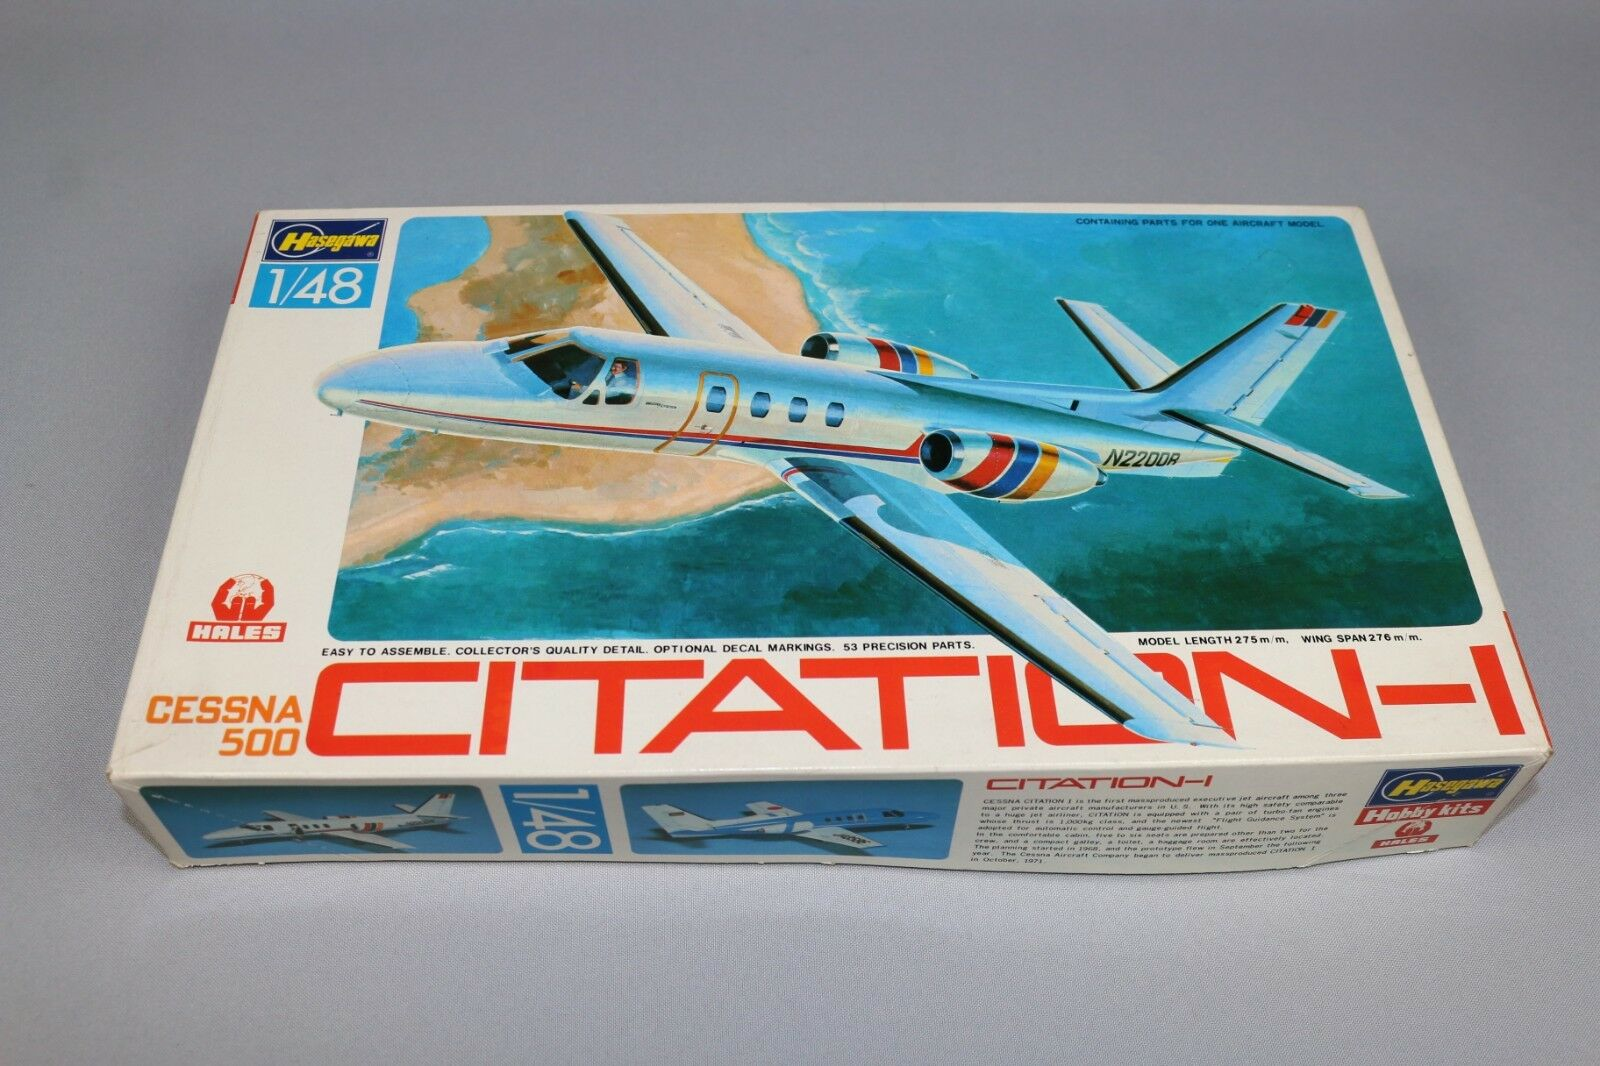 ZF233 Hasegawa Hales 1 48 maquette avion T2 T002 1200 citation-1 cessna 500